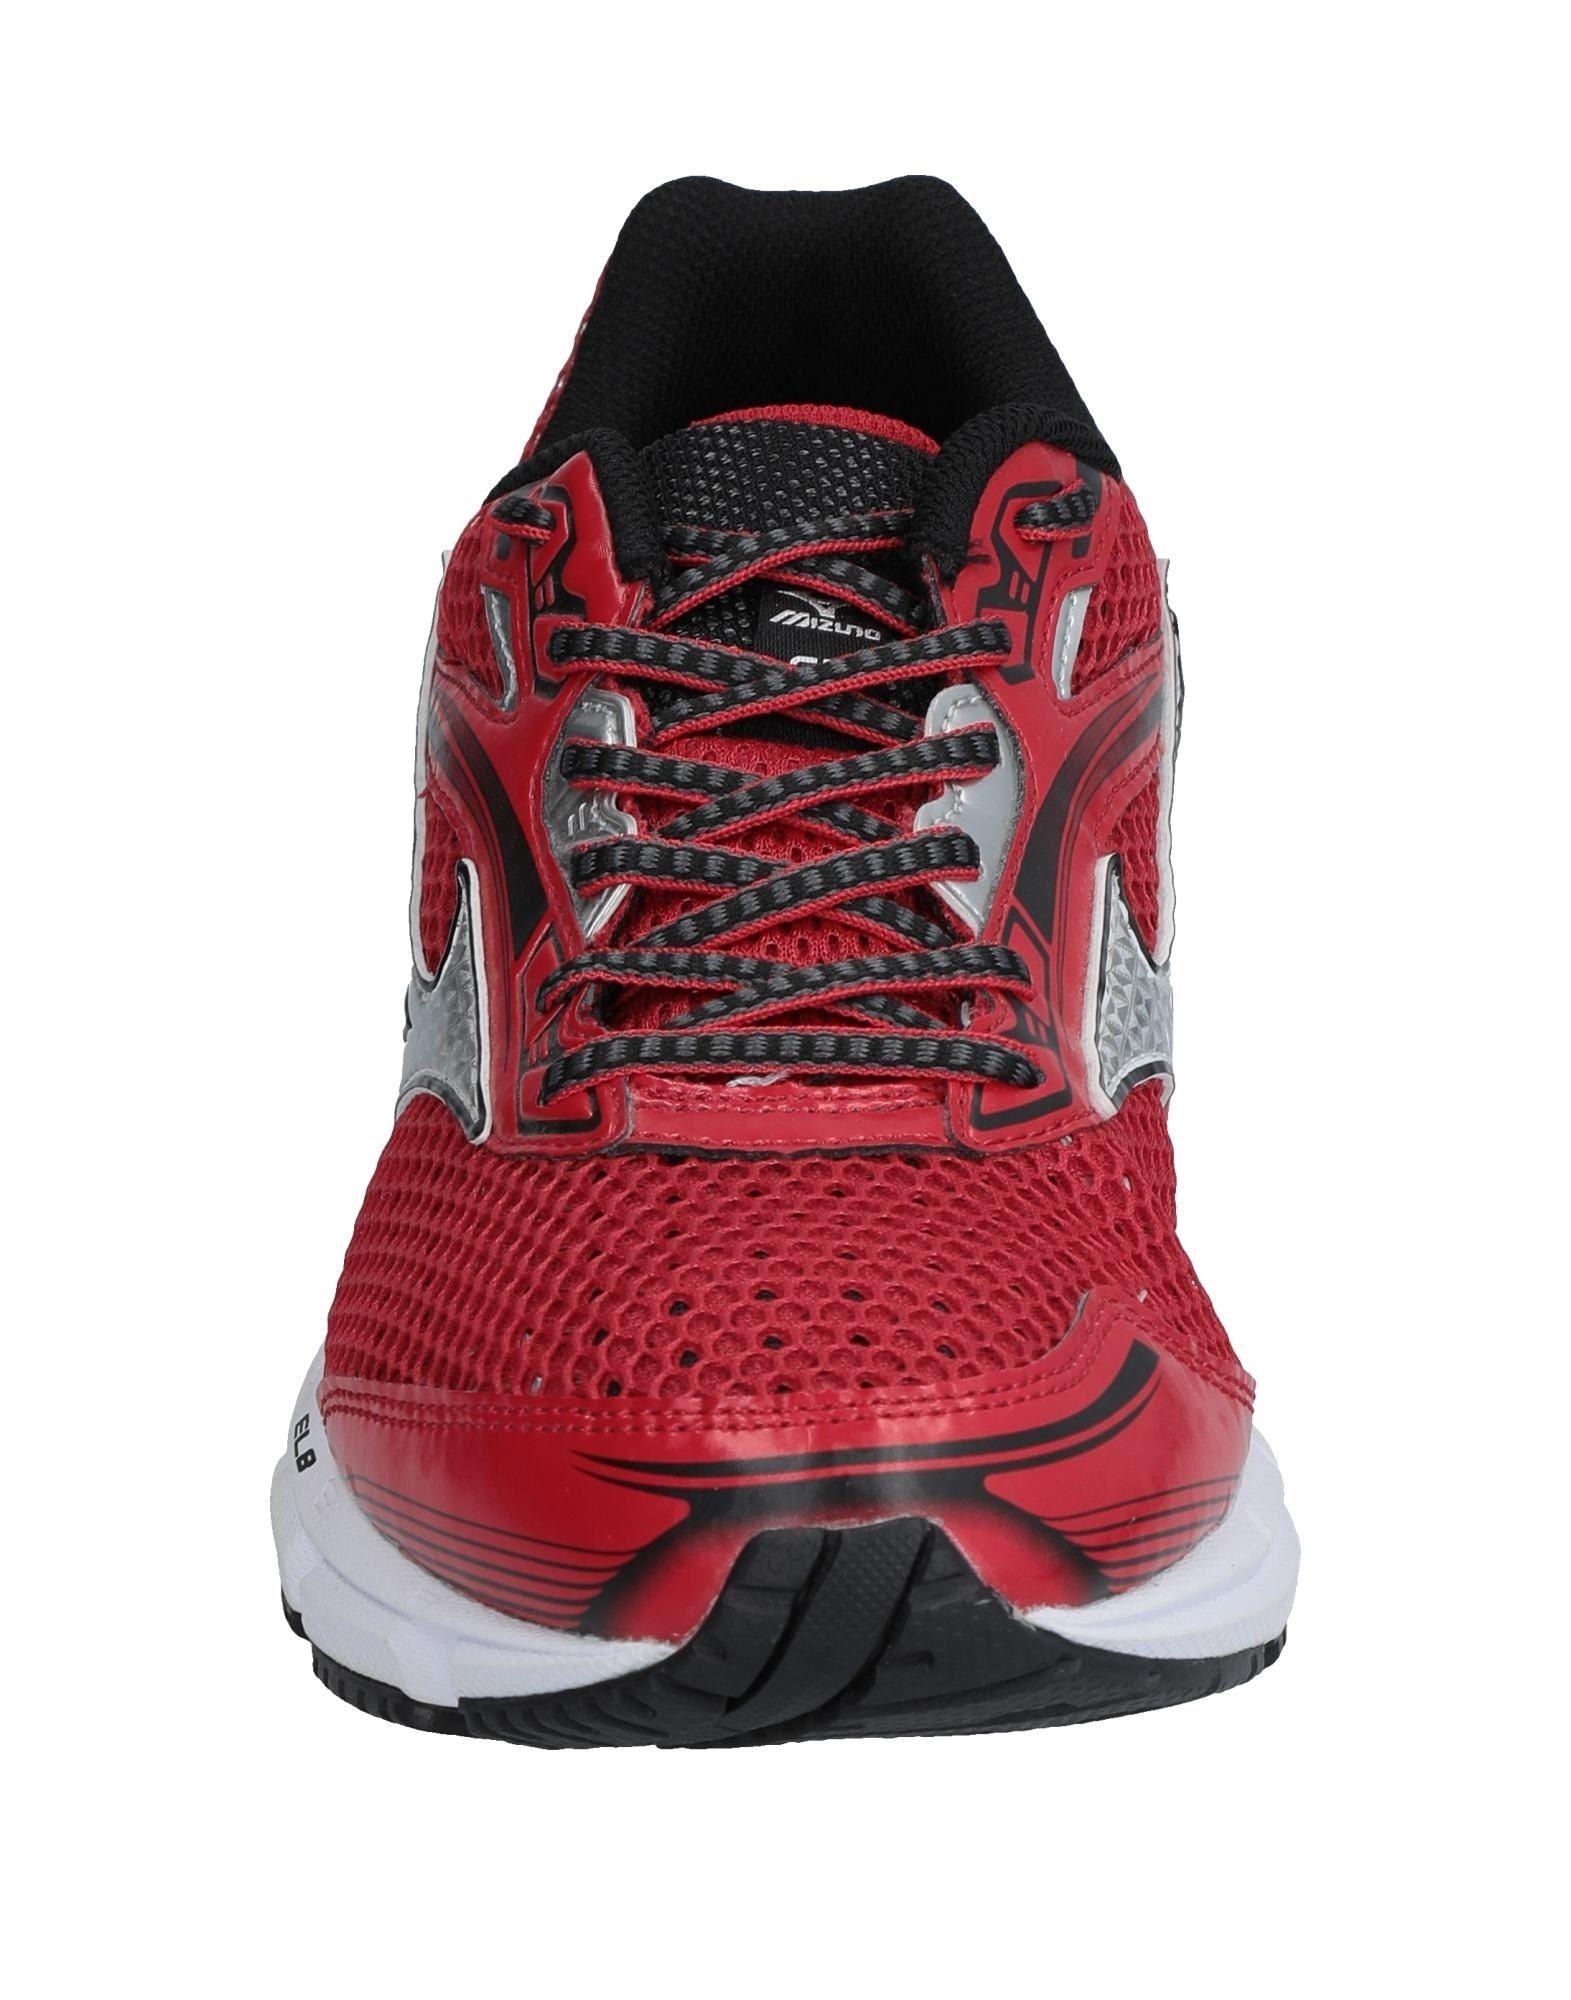 Rabatt echte Sneakers Schuhe Mizuno Sneakers echte Herren  11541824FW dd06e3